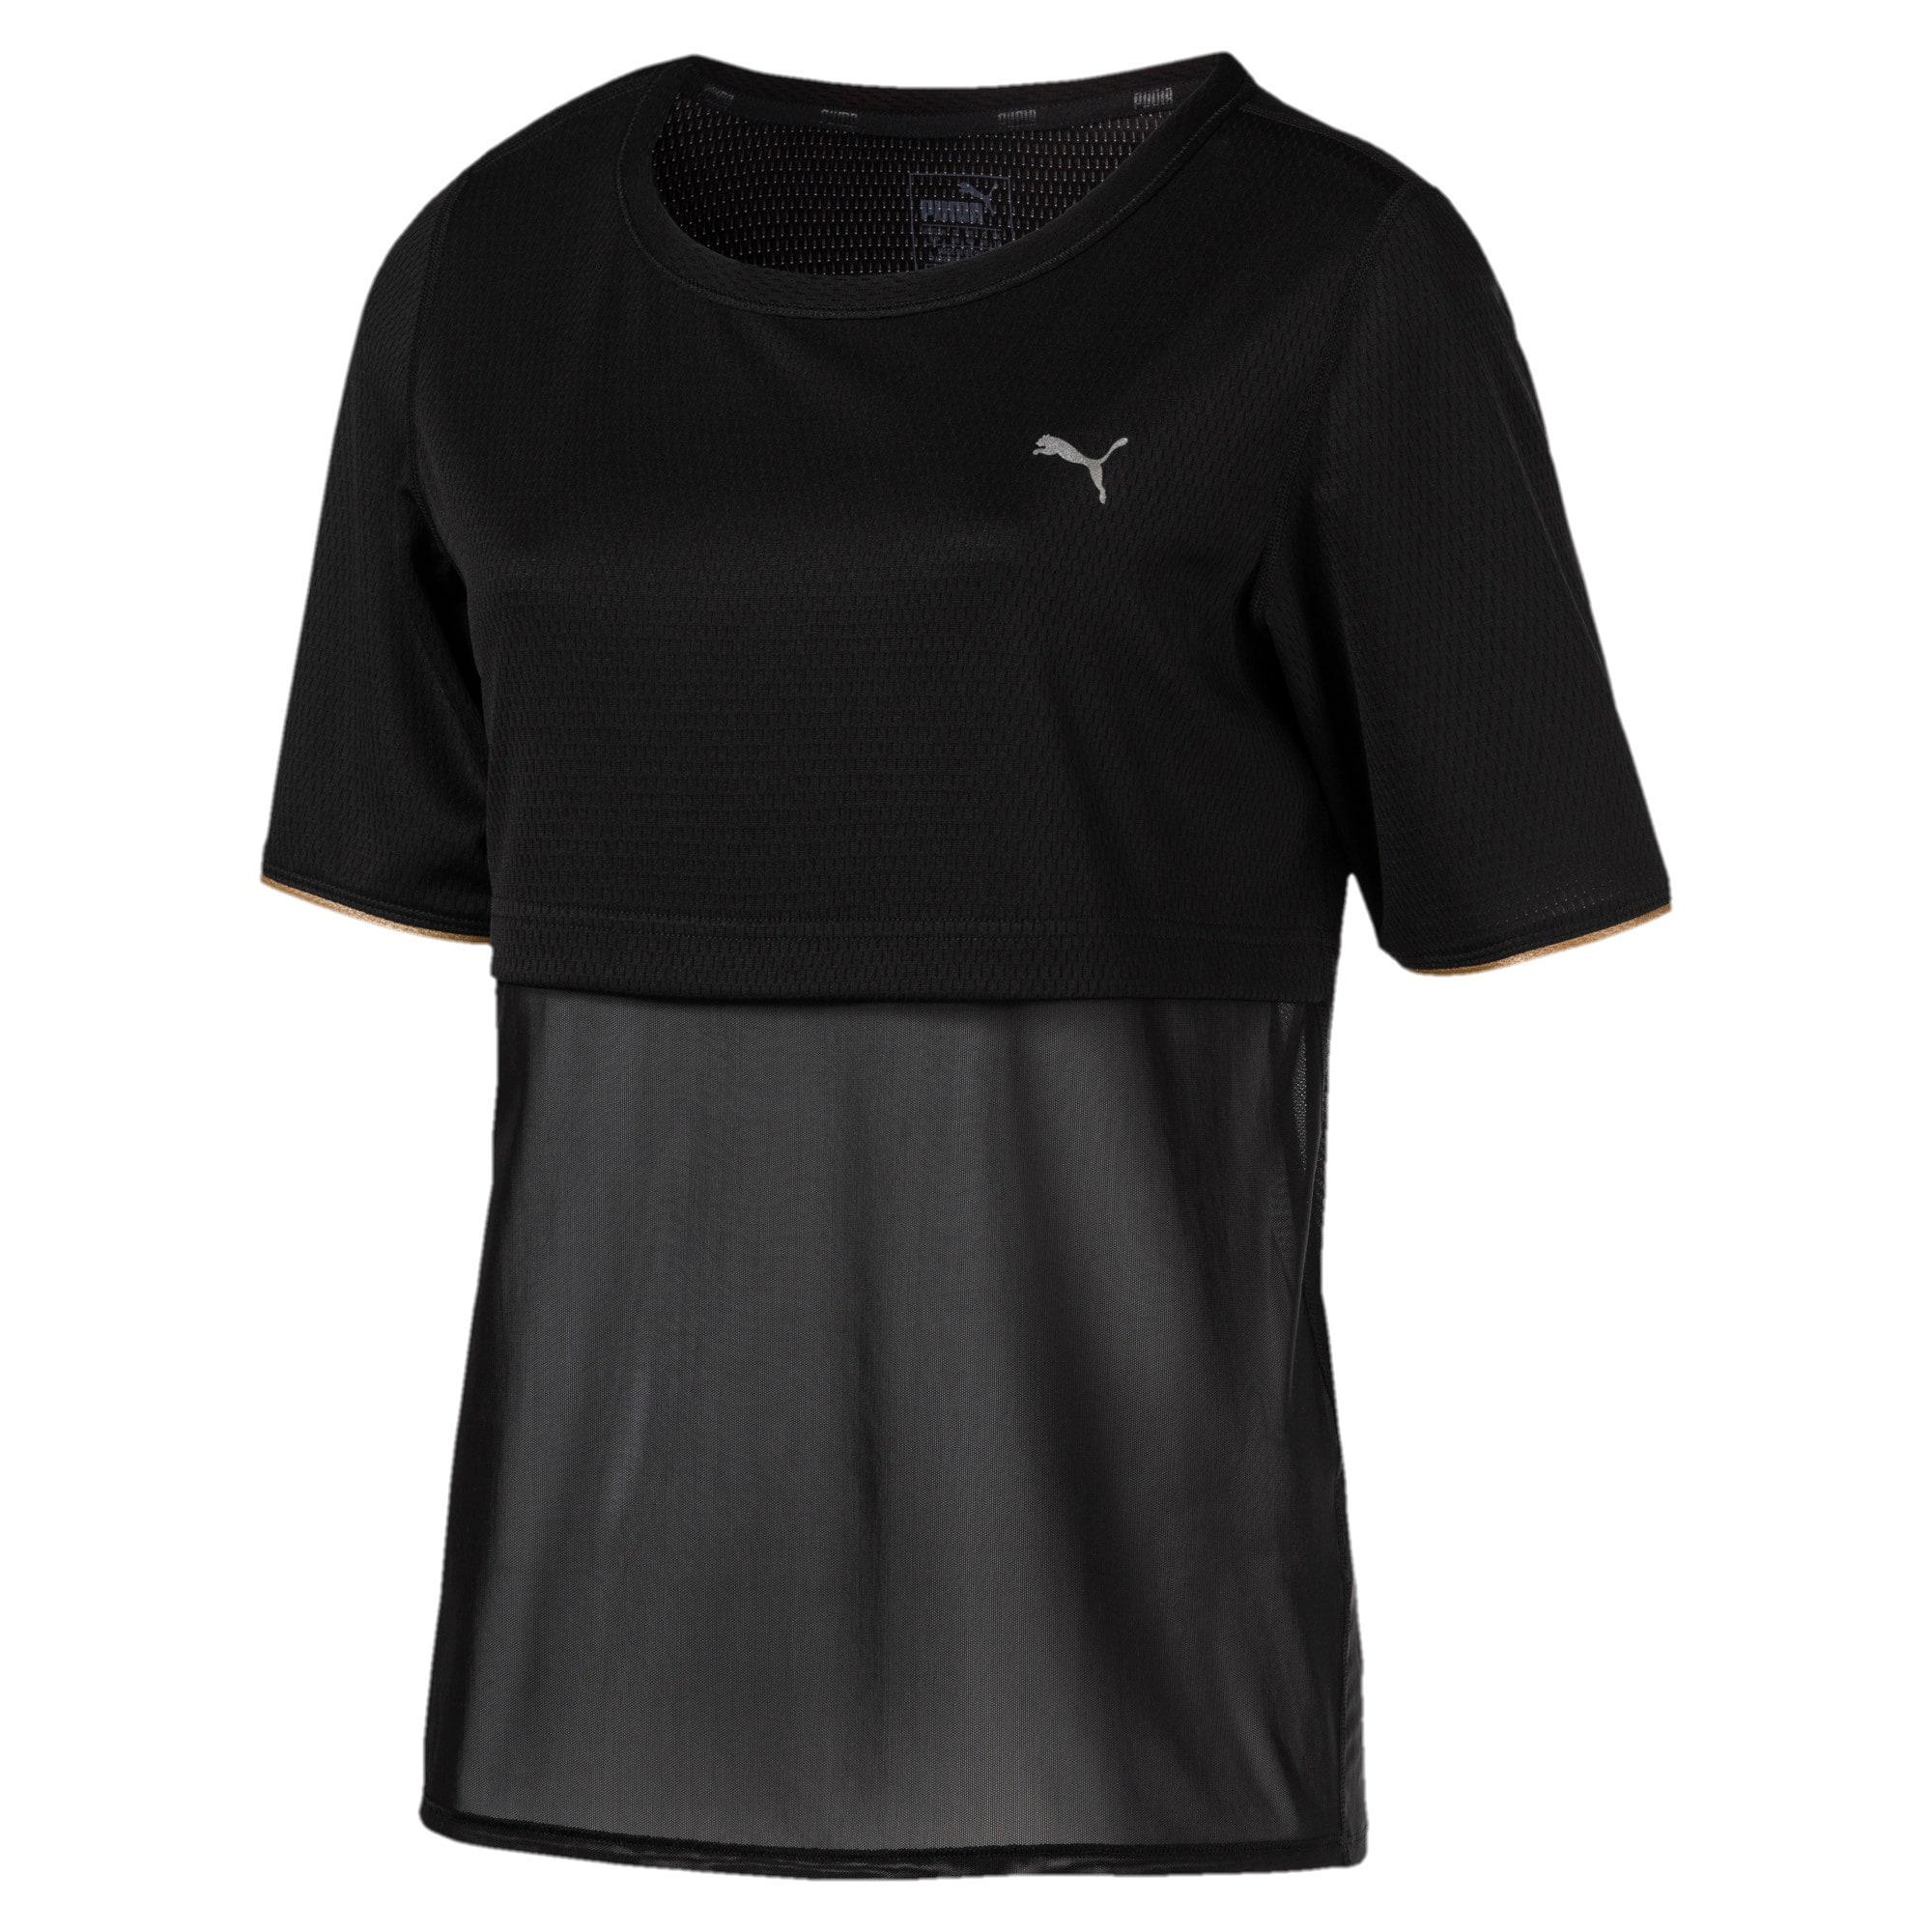 Thumbnail 1 of A.C.E. Reveal Women's Training Top, Puma Black, medium-IND